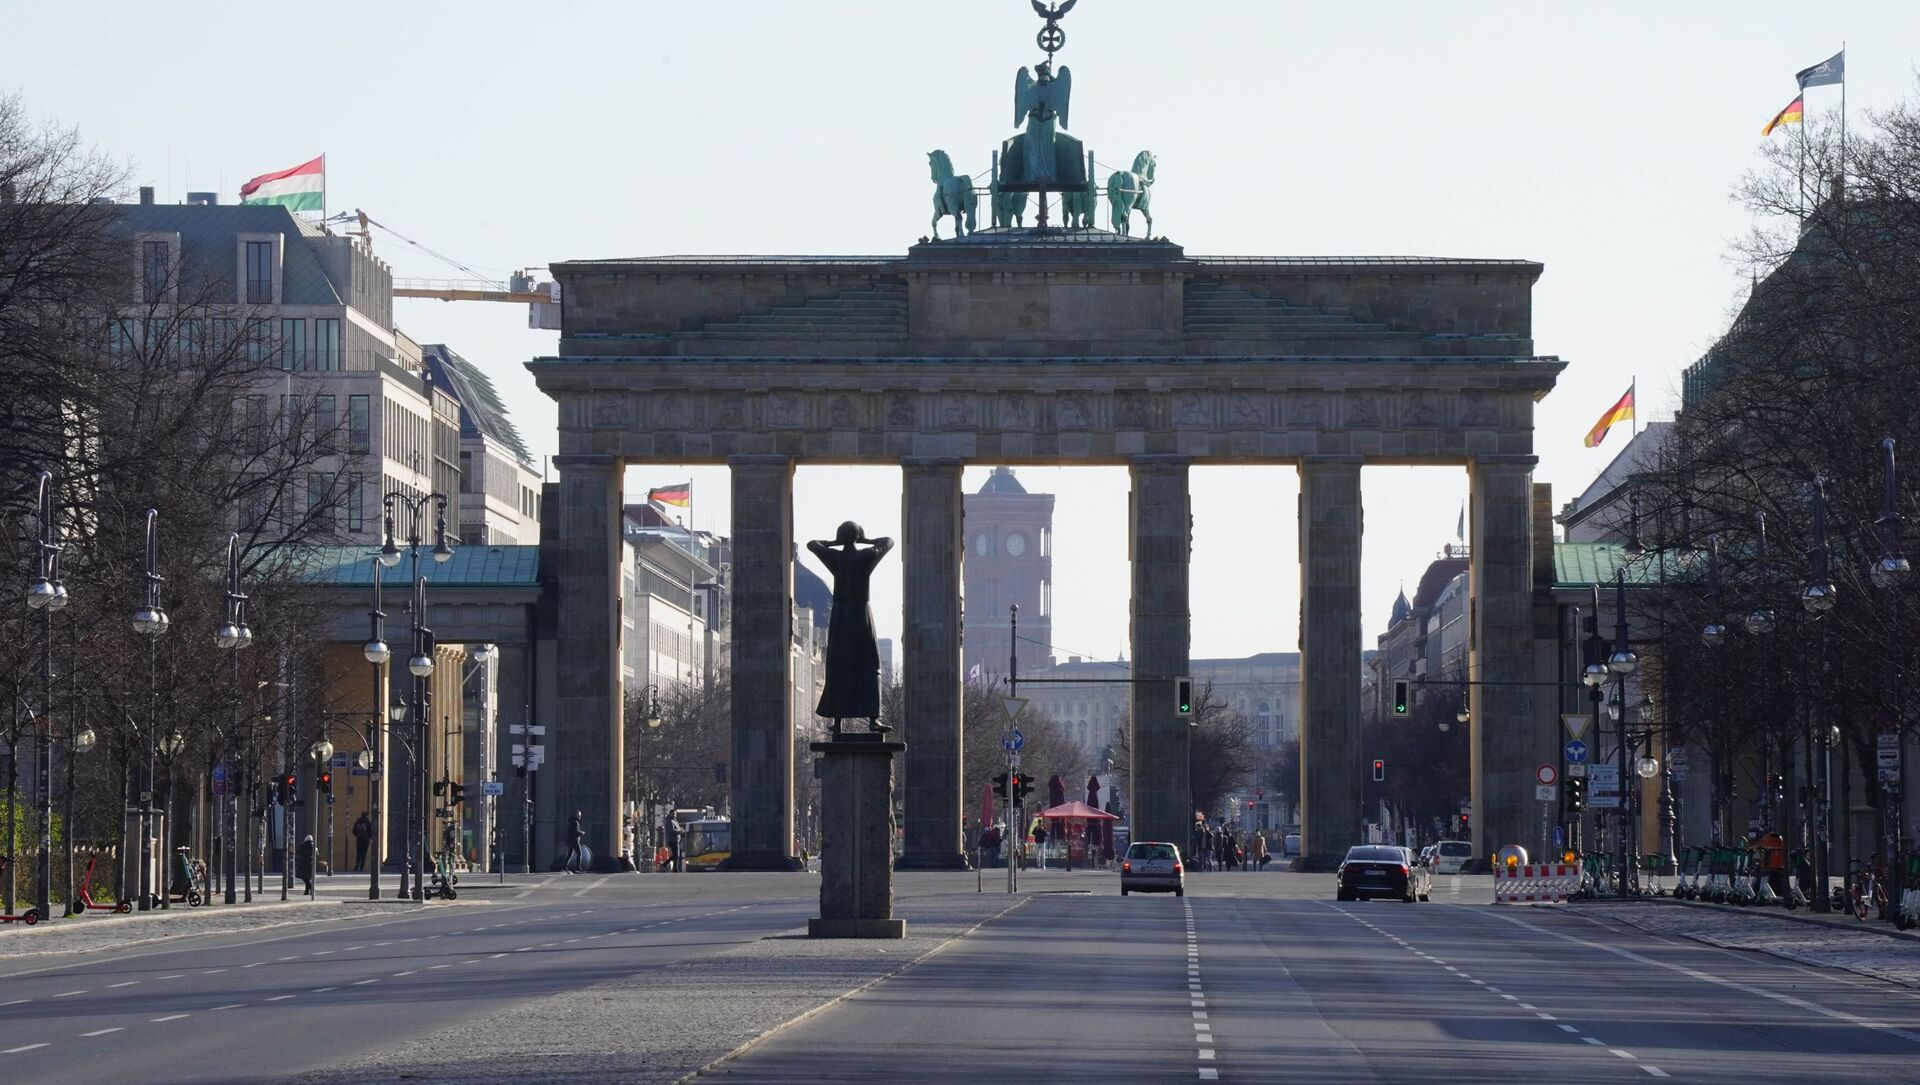 Brama Brandenburska w Berlinie. - Sputnik Polska, 1920, 26.02.2021